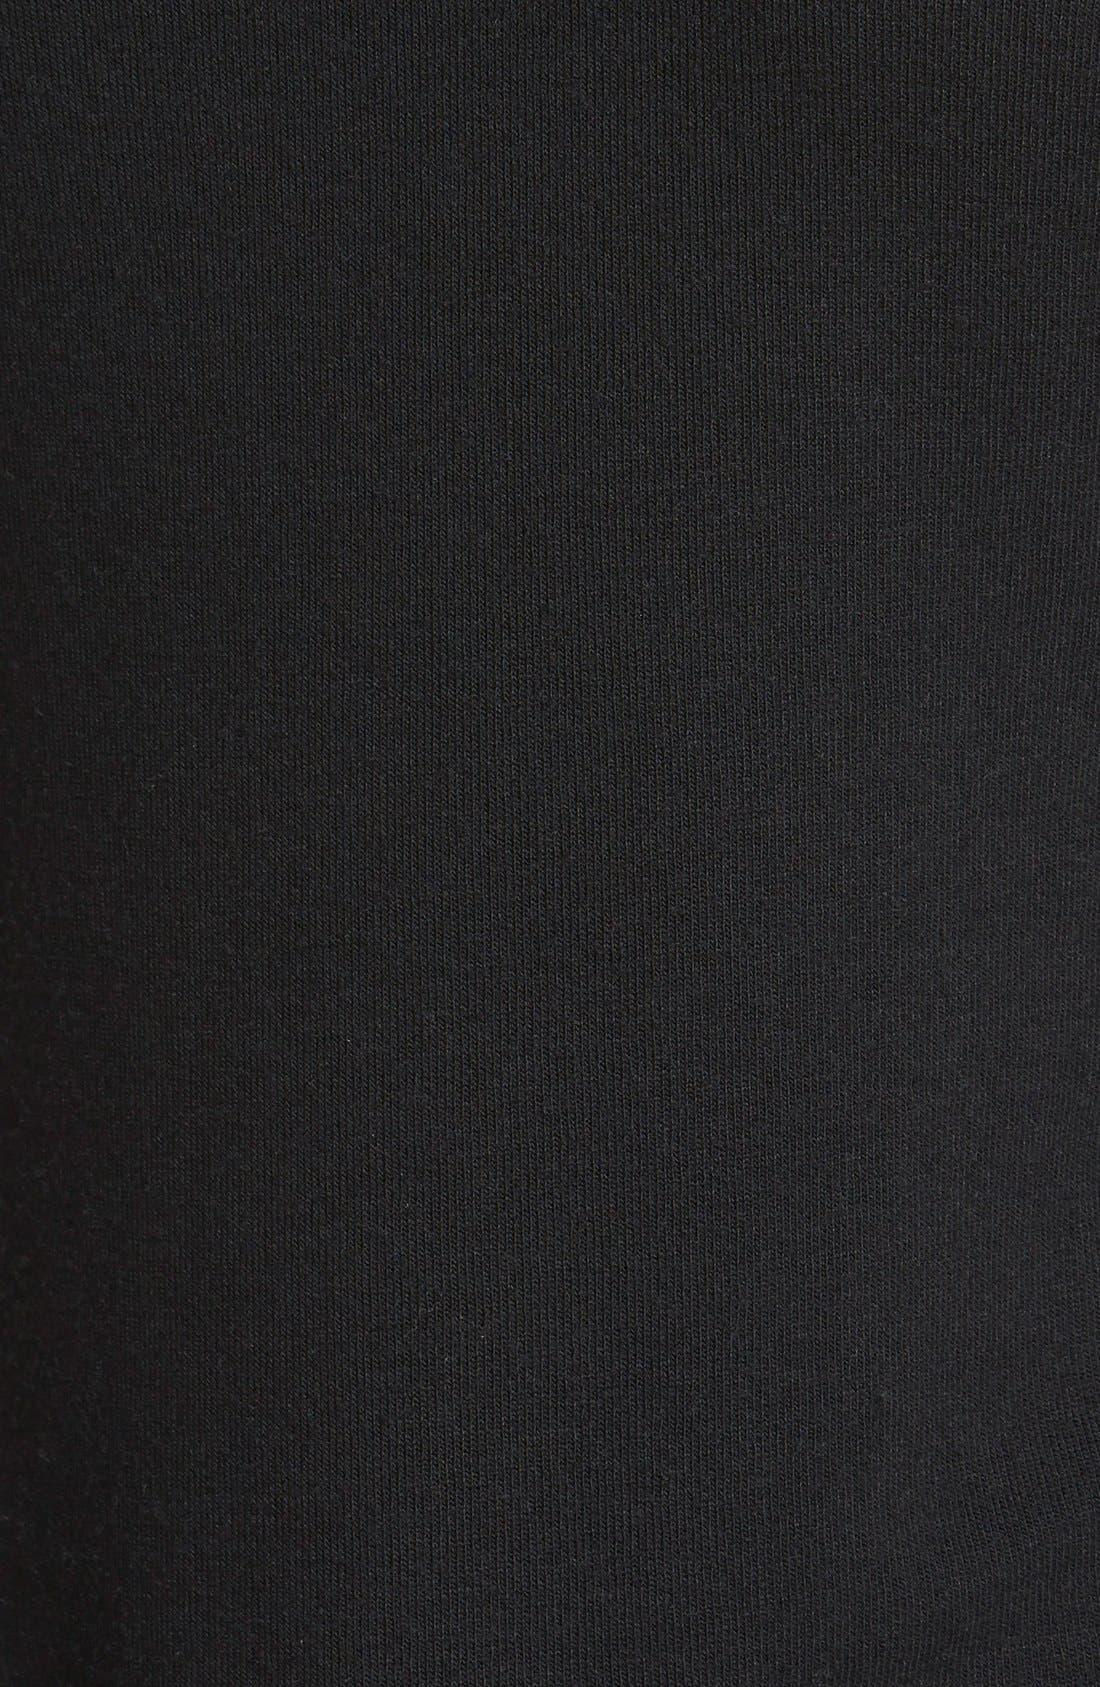 Alternate Image 3  - Bailey 44 'Bunny Slope' Sweater